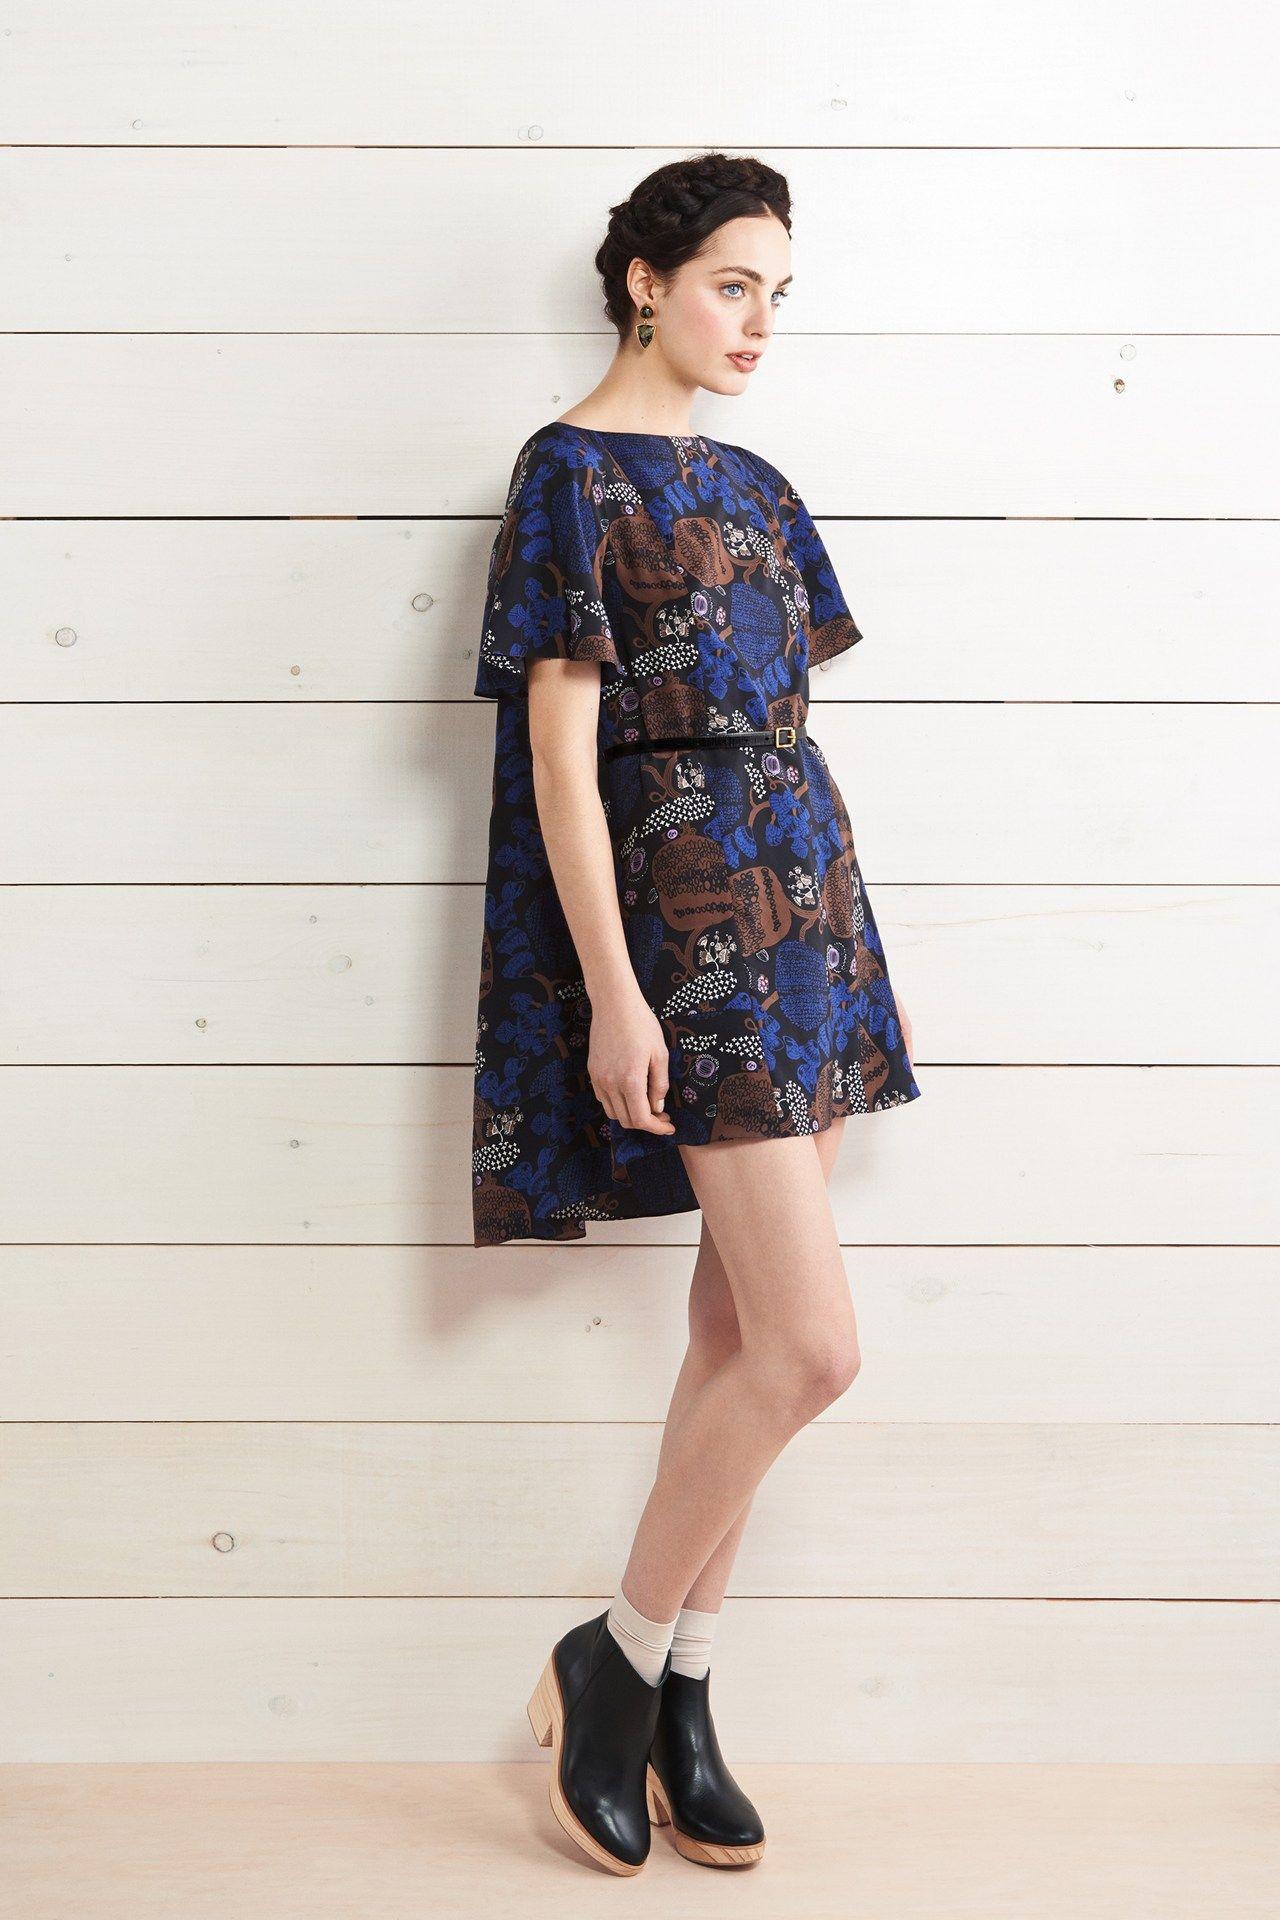 Whit fashion collection, autumn/winter 2014